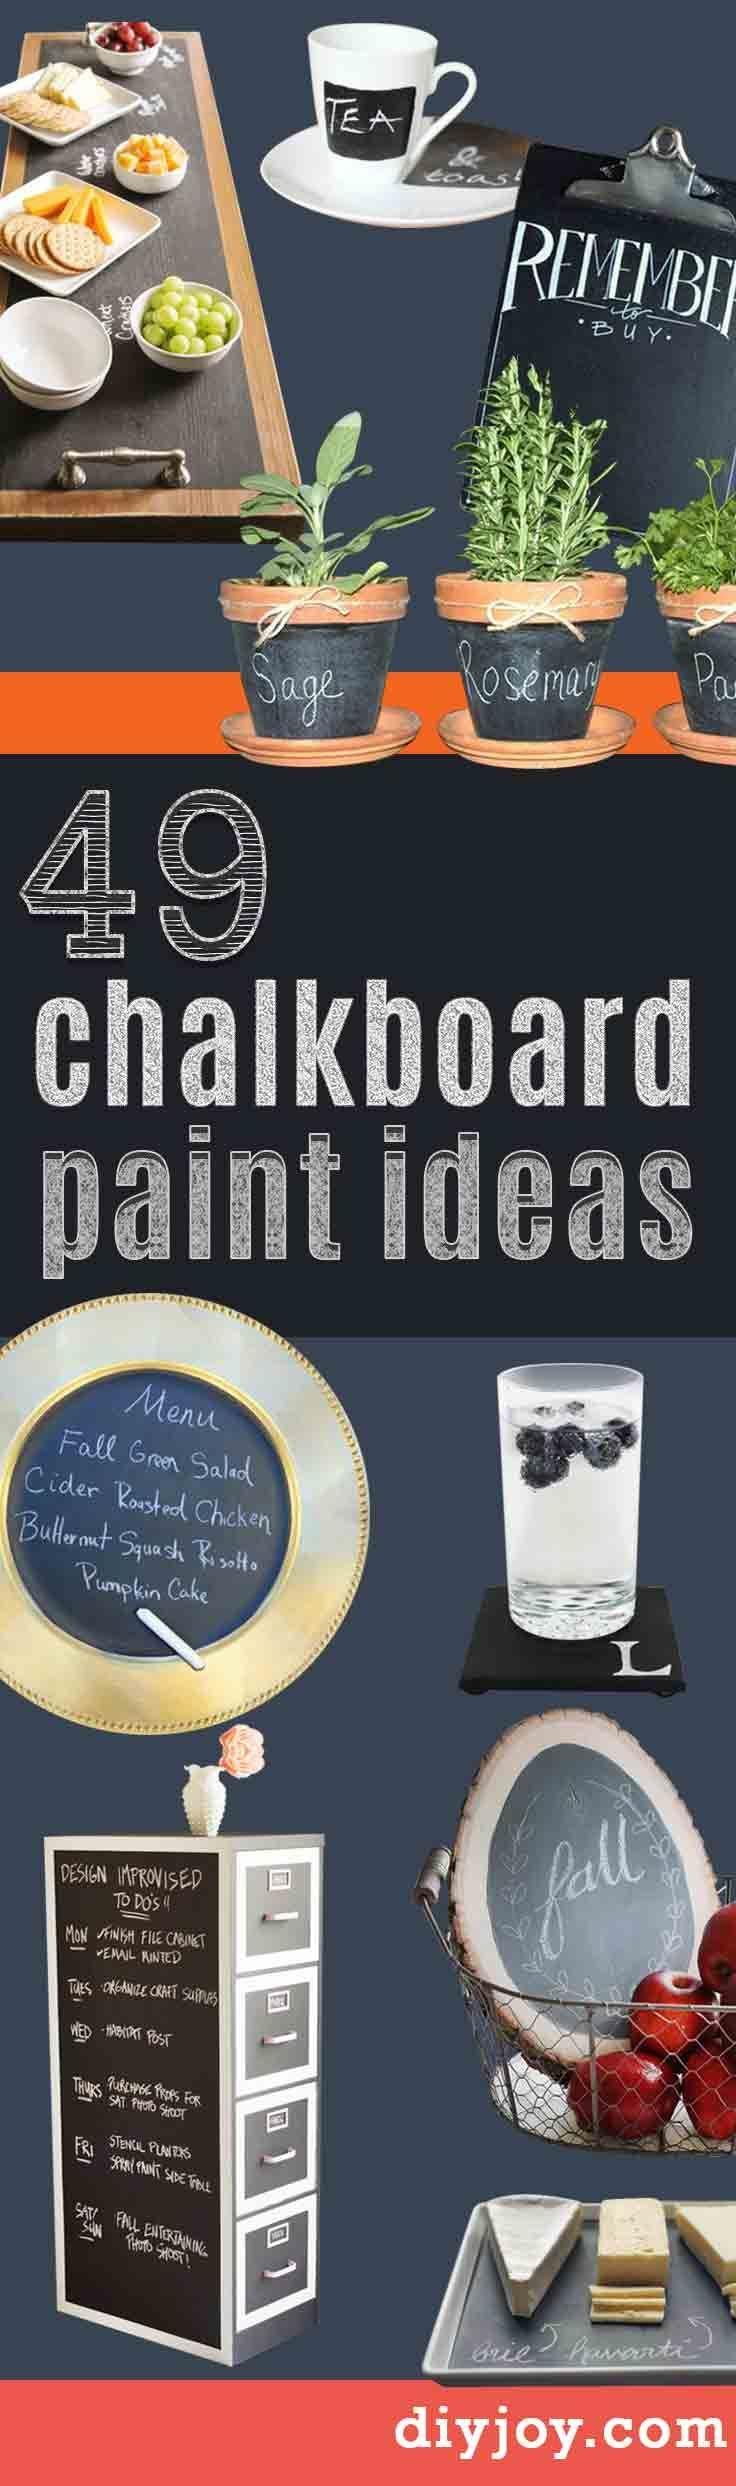 1000 ideas about chalkboard paint on pinterest diy for Chalkboard paint ideas for bedroom